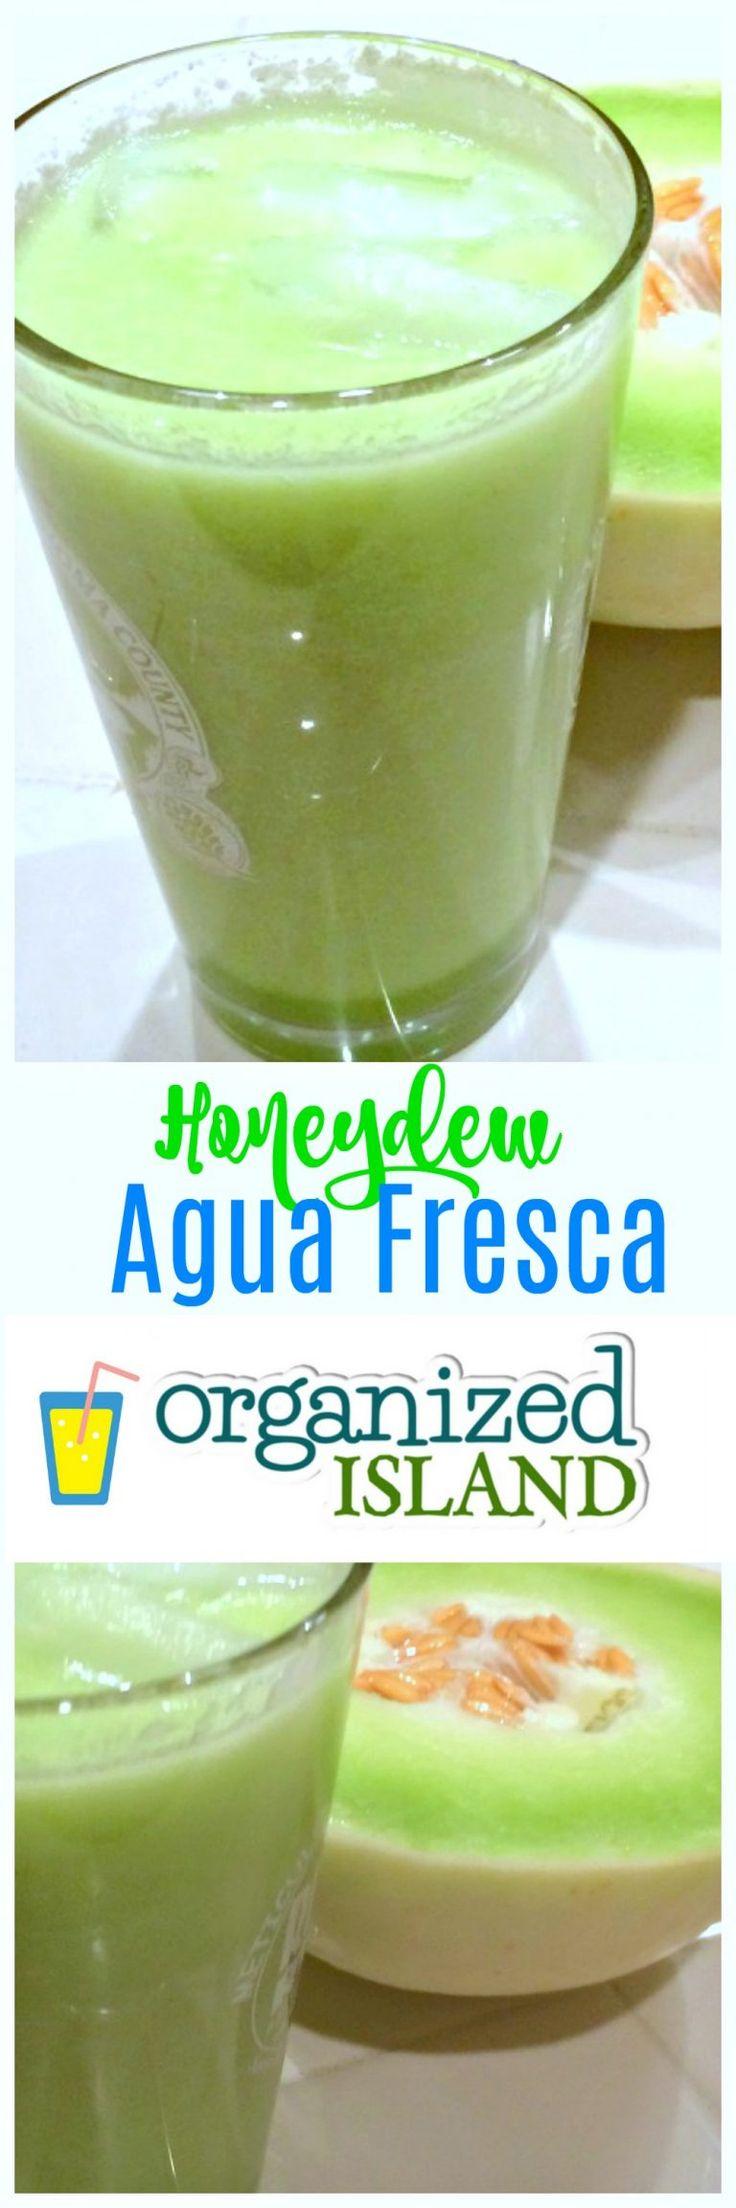 Easy Honeydew Agua Fresca Recipe - a refreshing non-alcoholic drink for summer! #agua #fresca #honeydew #melon #beverage #aguafresca #drinkrecipe